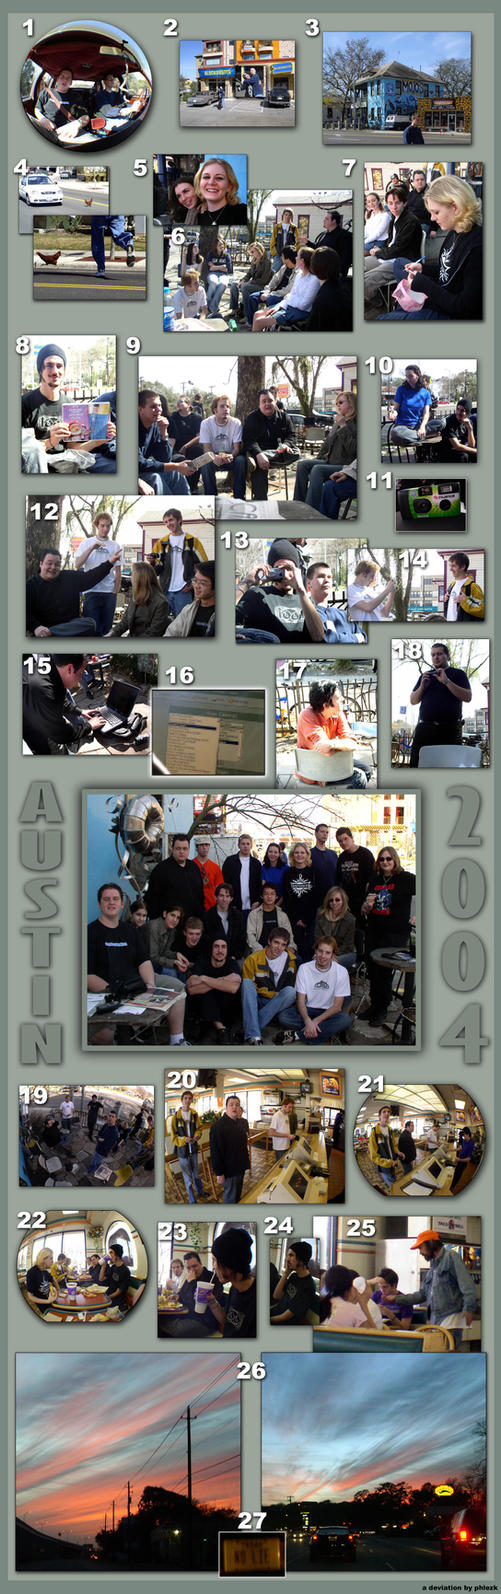 + AUSTIN DEVMEET 2004 + by phlezk